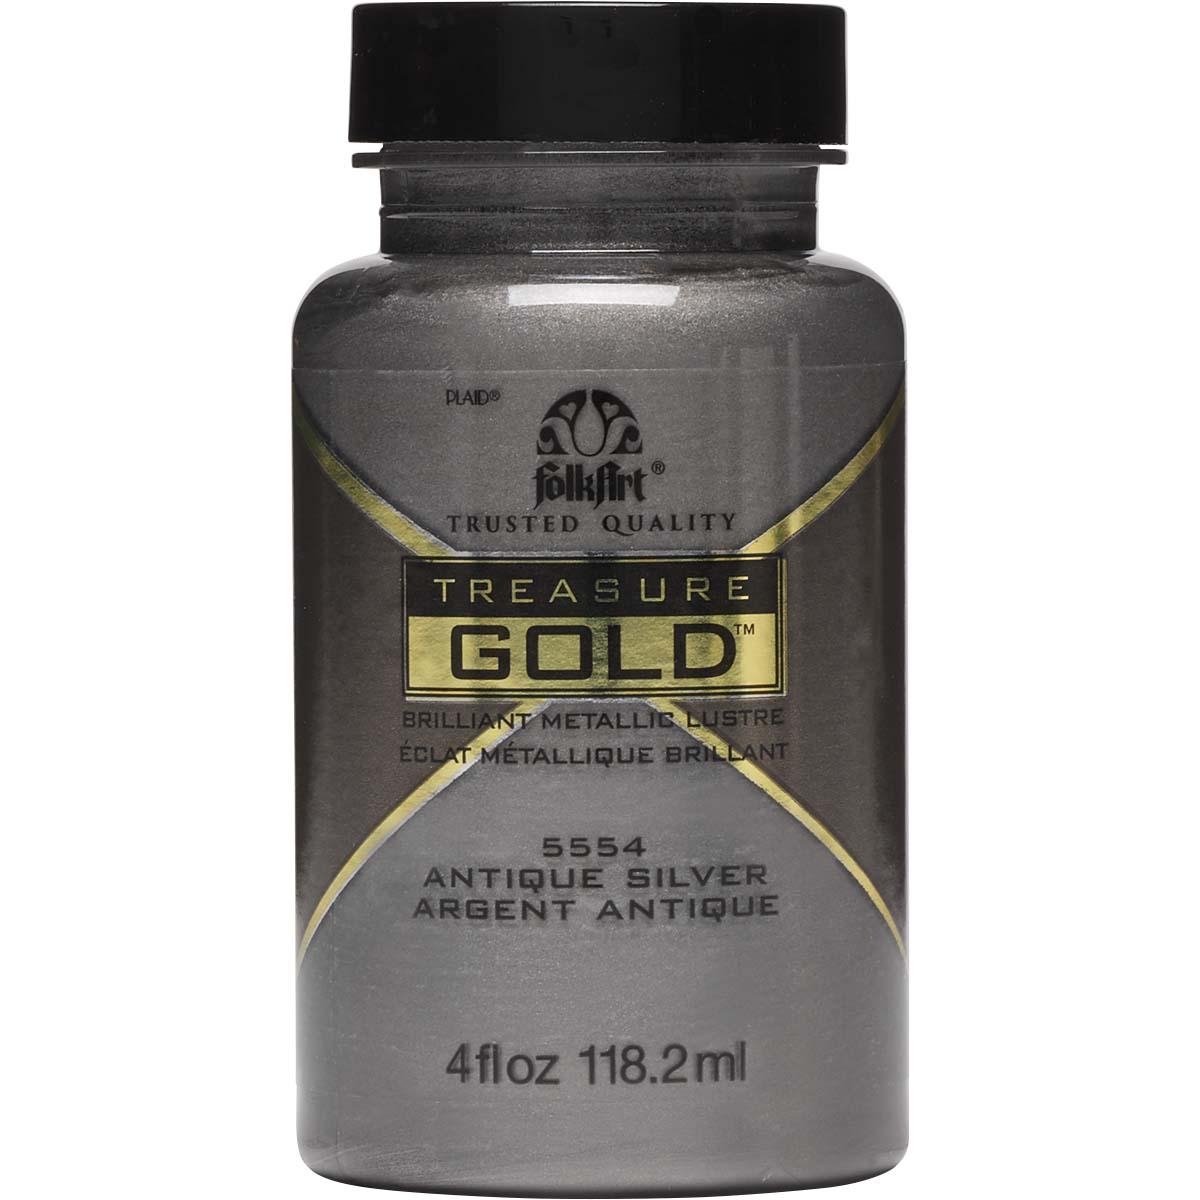 FolkArt ® Treasure Gold™ - Antique Silver, 4 oz. - 5554